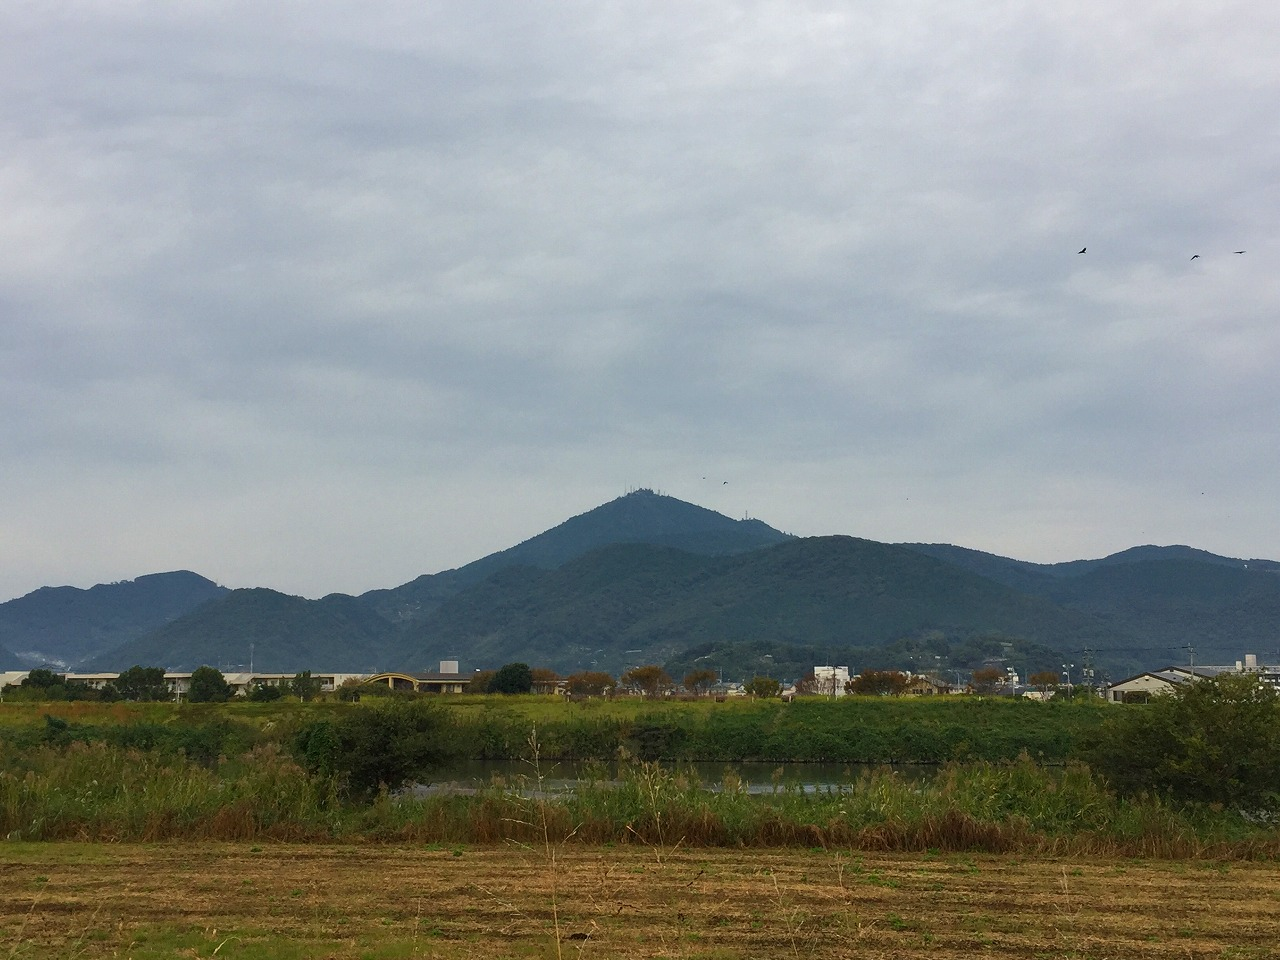 今朝の金峰山 2016.10.31